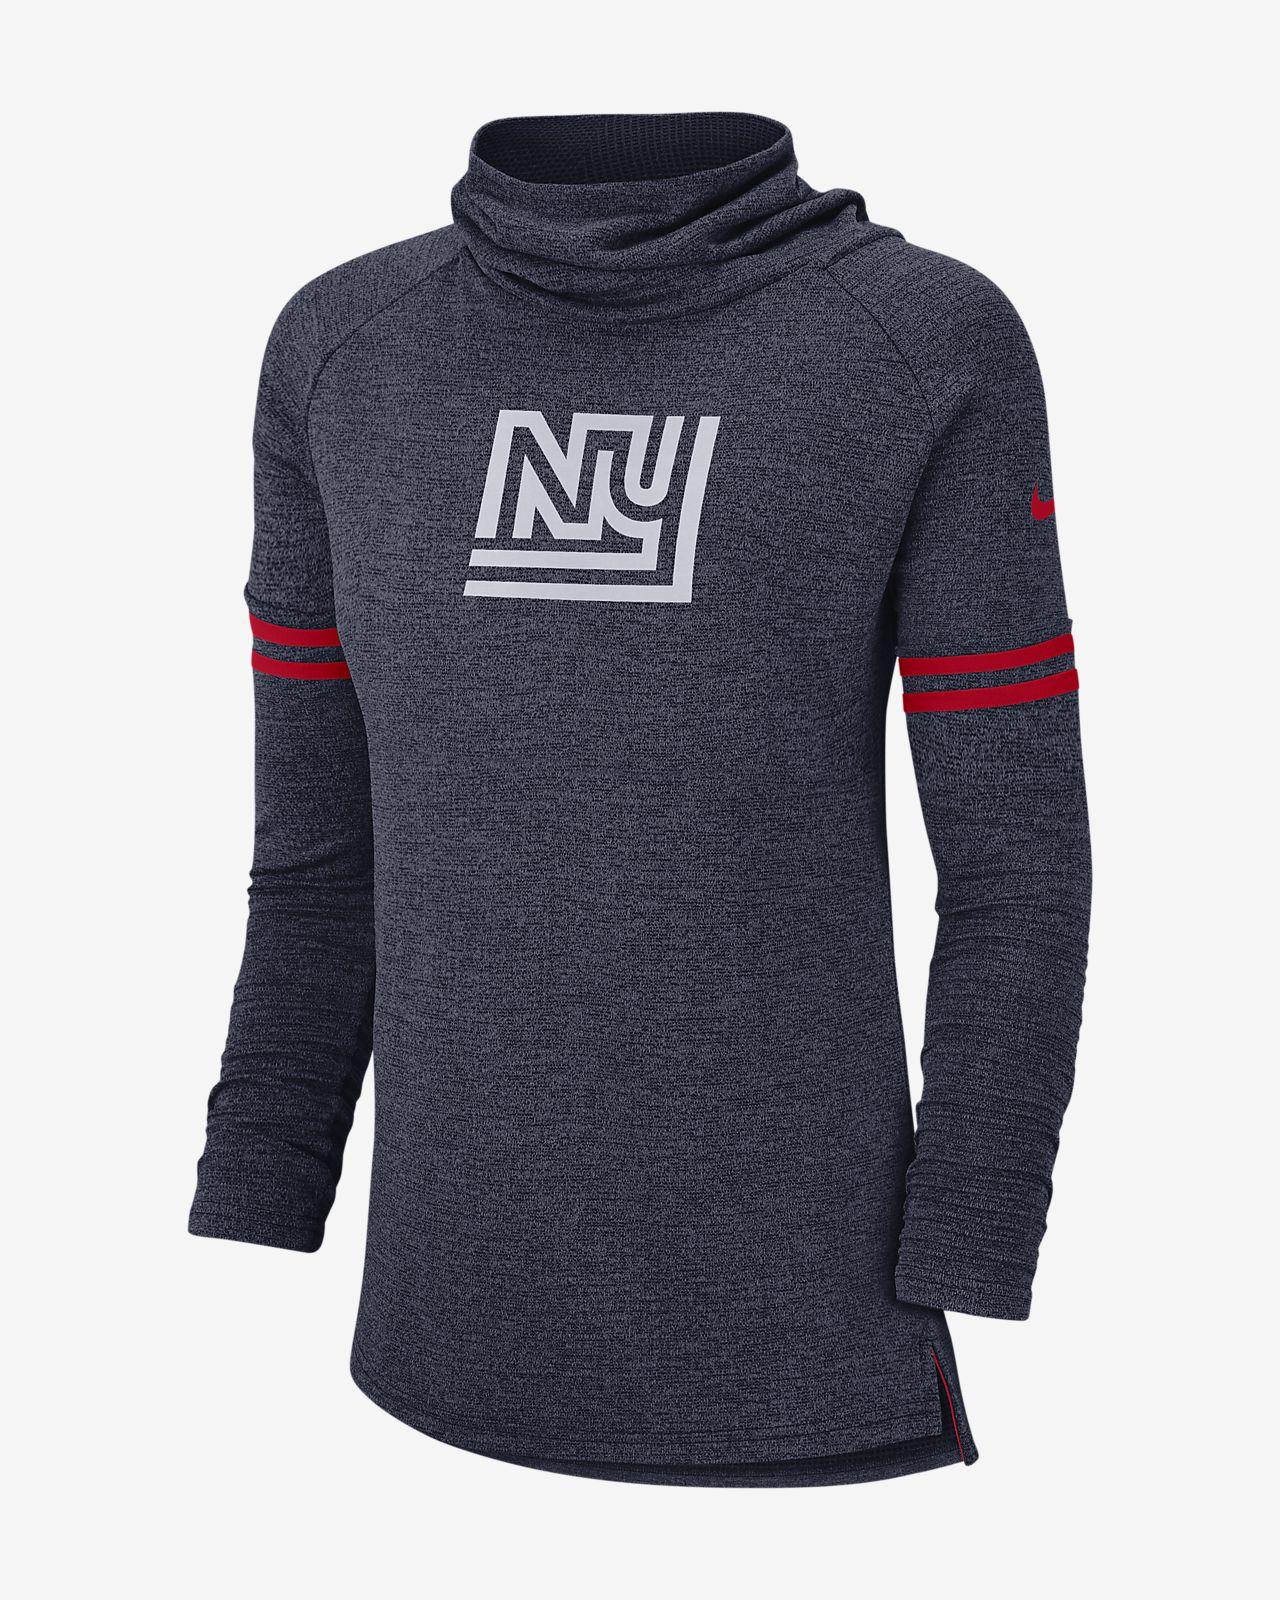 Nike (NFL Giants) Women's Long Sleeve Top